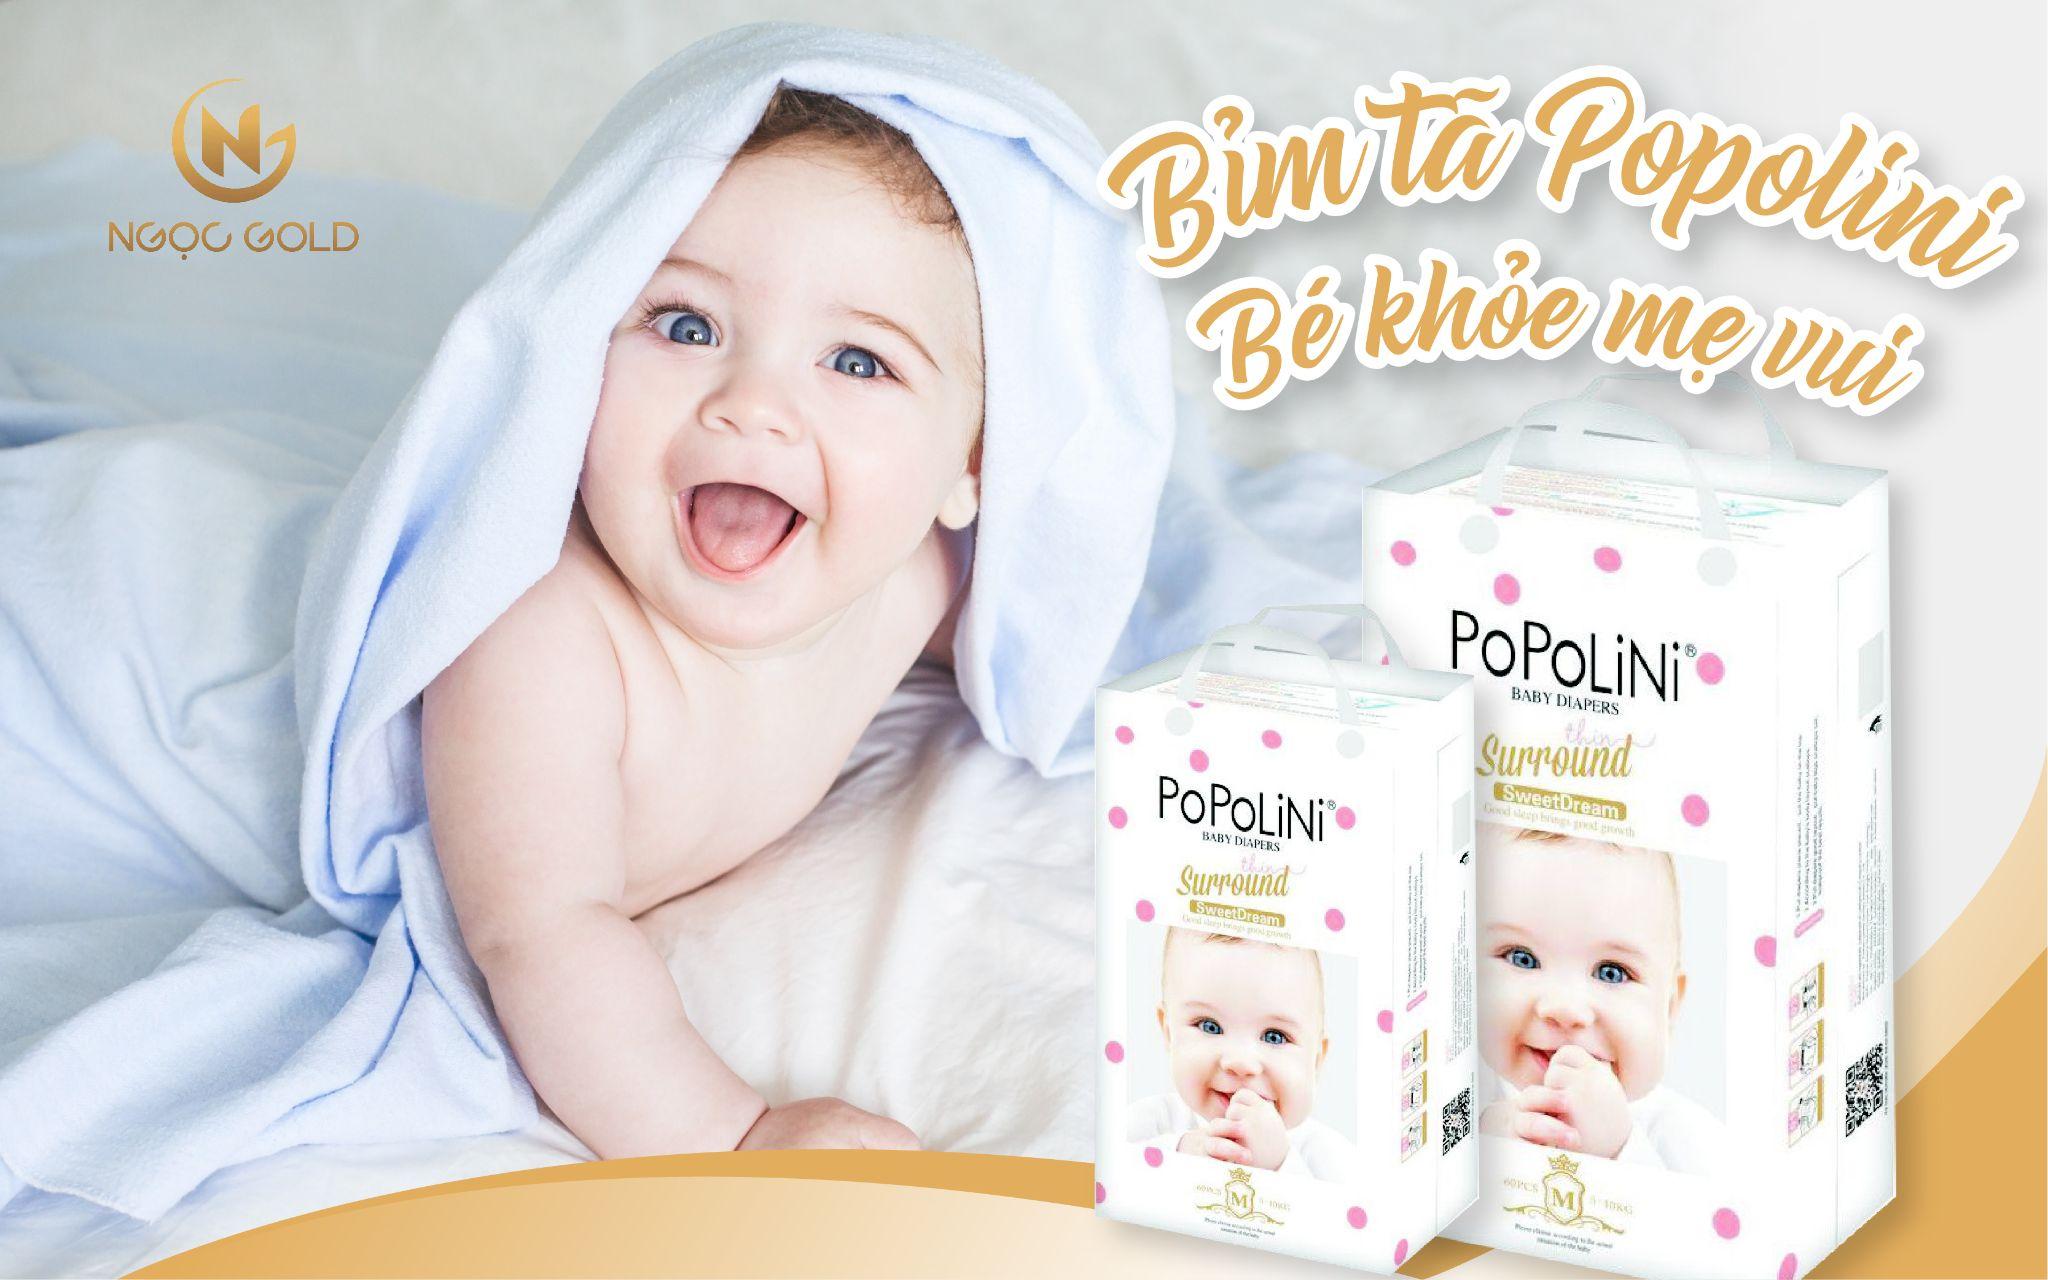 Bỉm/tã Popolini - Bé khỏe mẹ vui